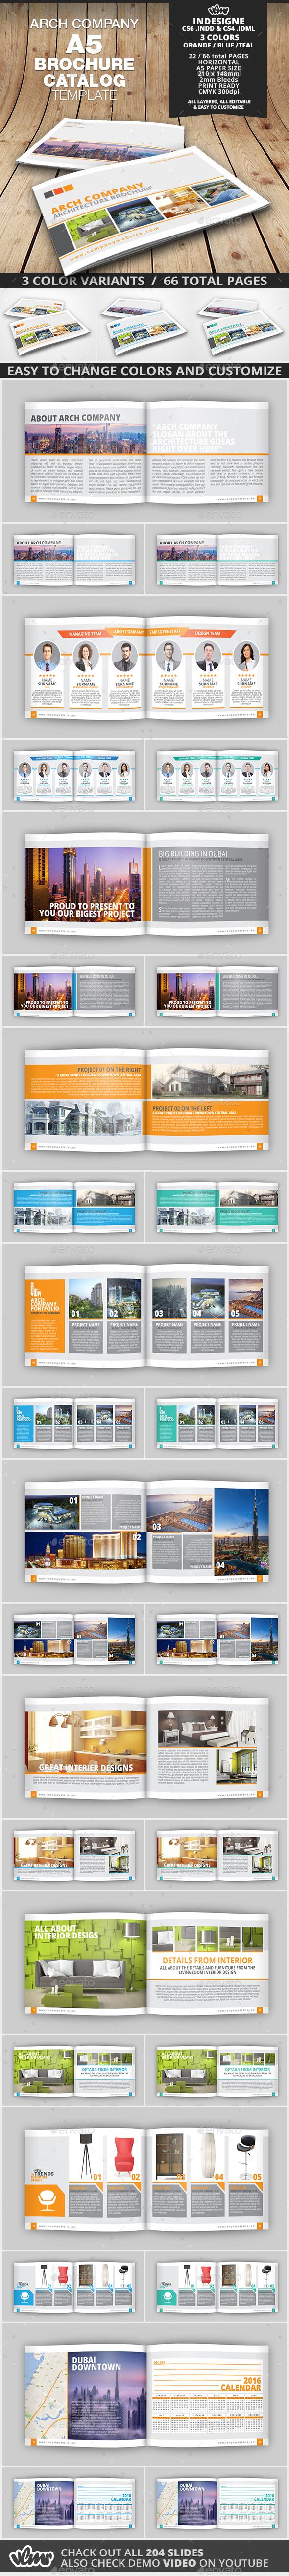 A5 Arch Company Brochure Catalog Template - Catalogs Brochures